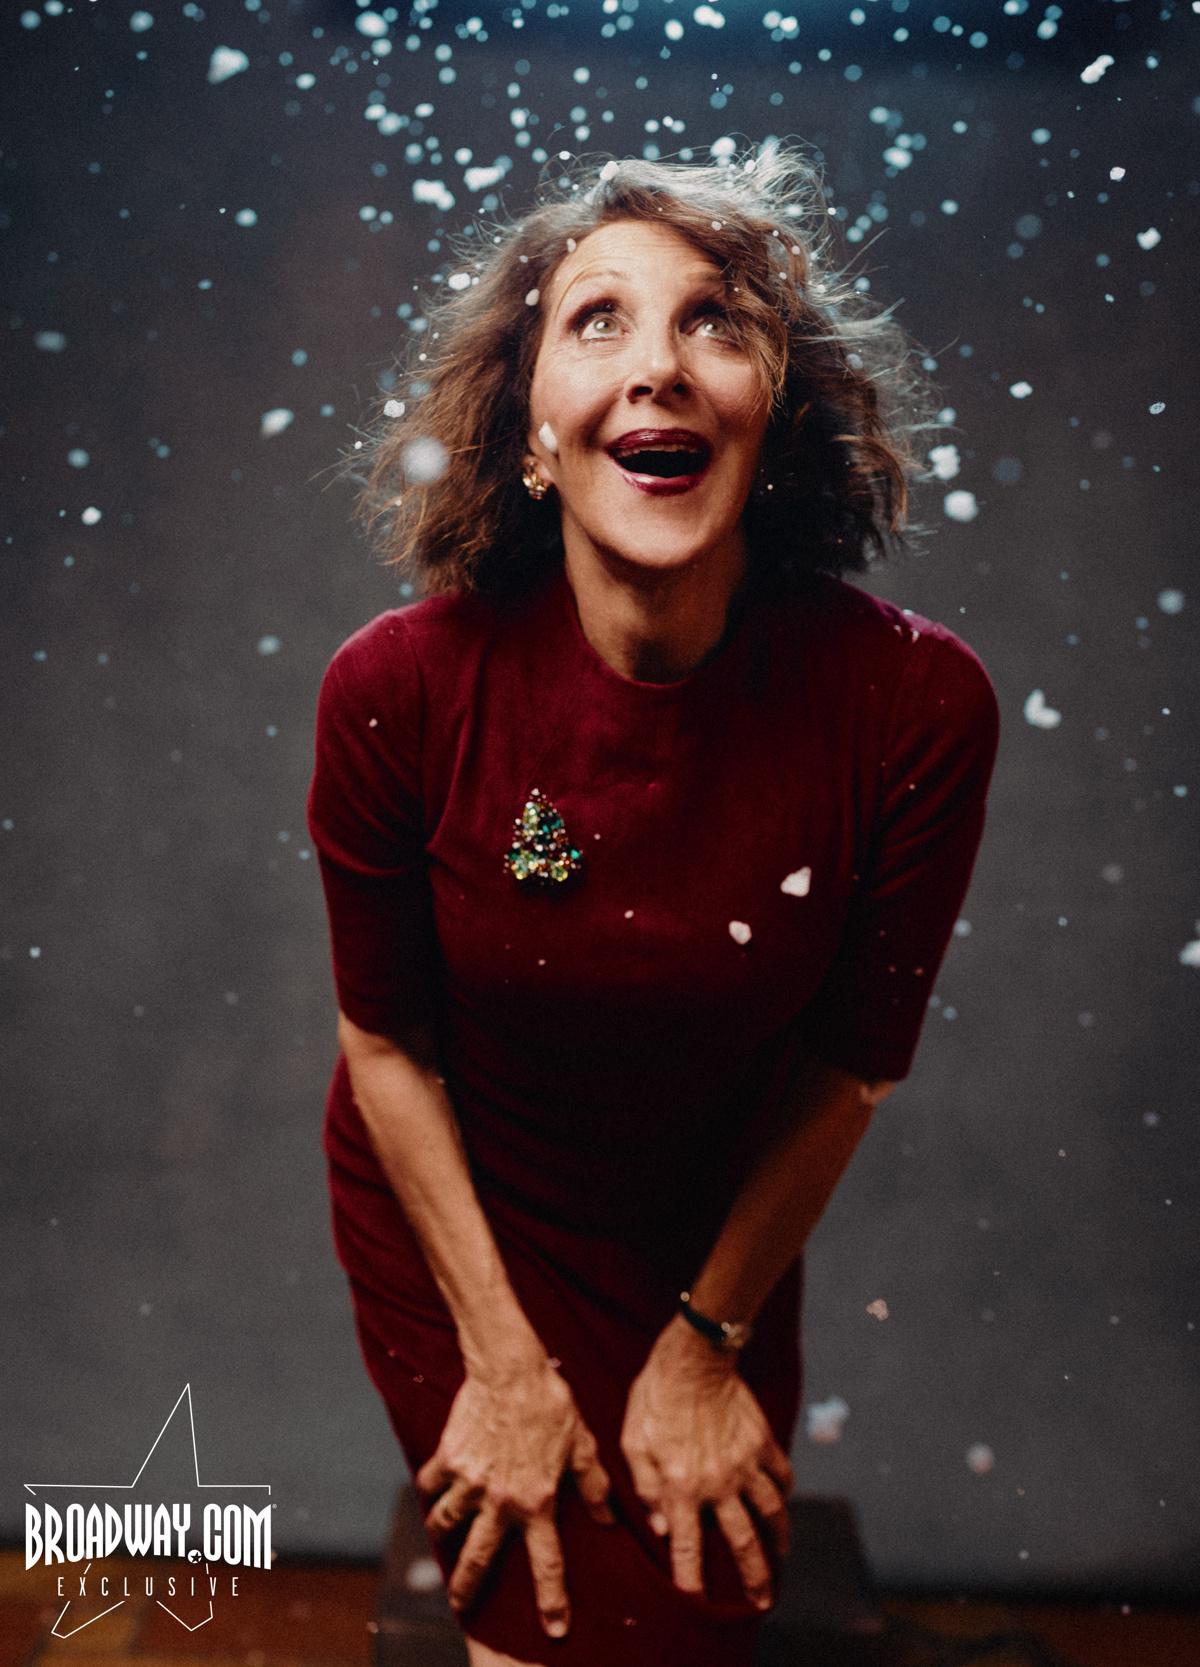 Opening Night Portrait Booth: A Christmas Carol   Broadway.com